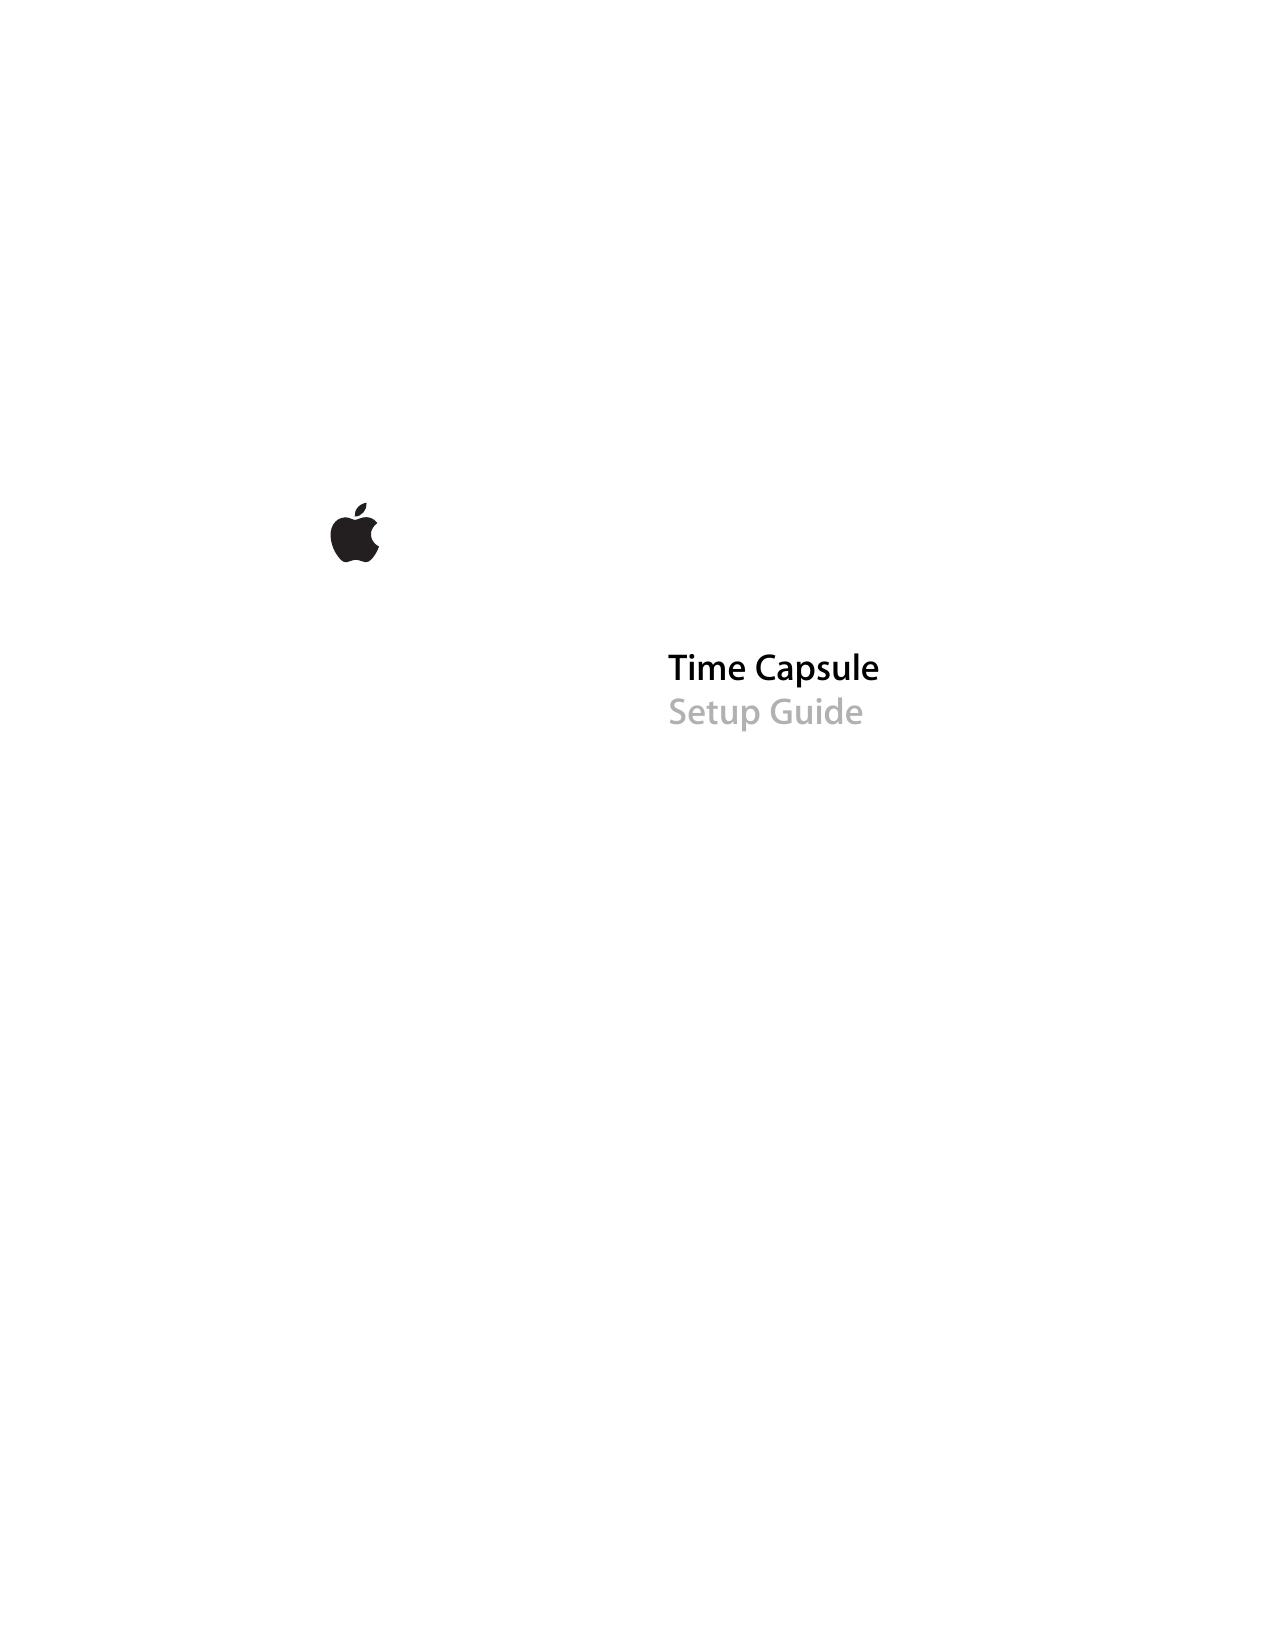 Time Capsule Setup Guide